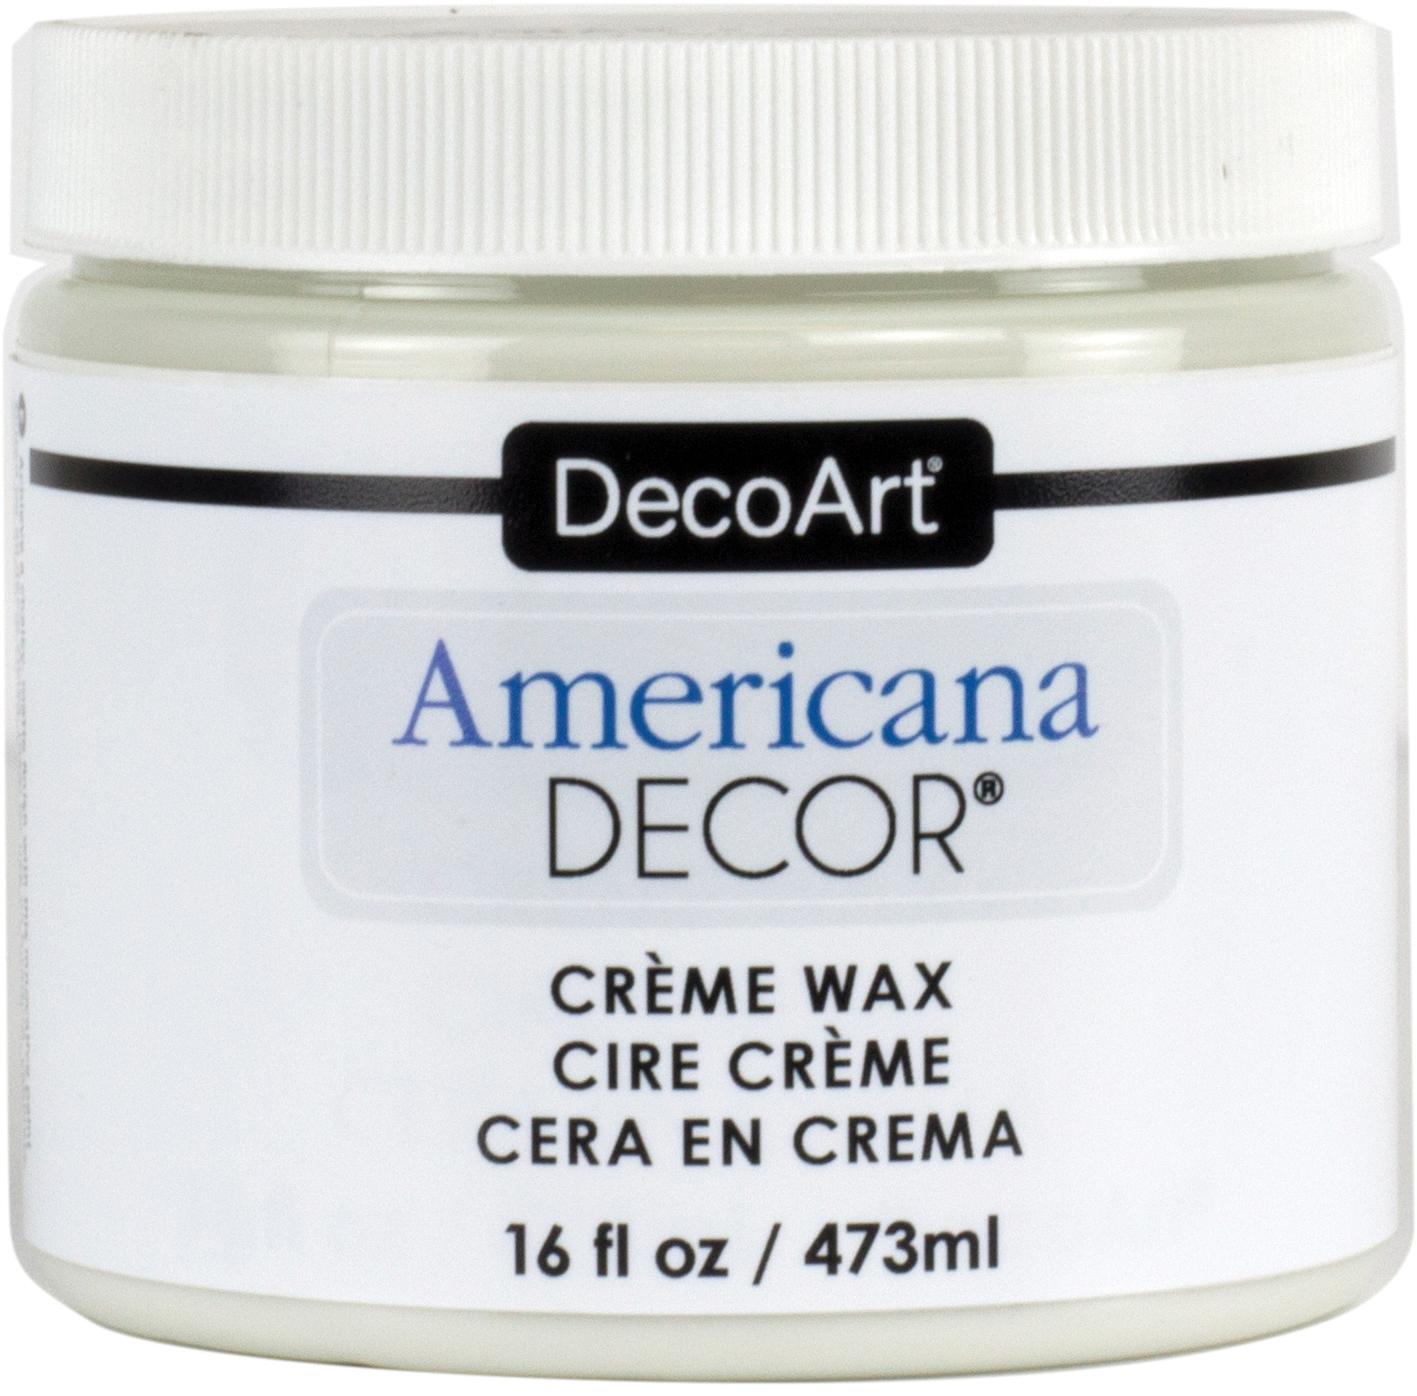 Americana Decor Creme Wax 16oz-Clear